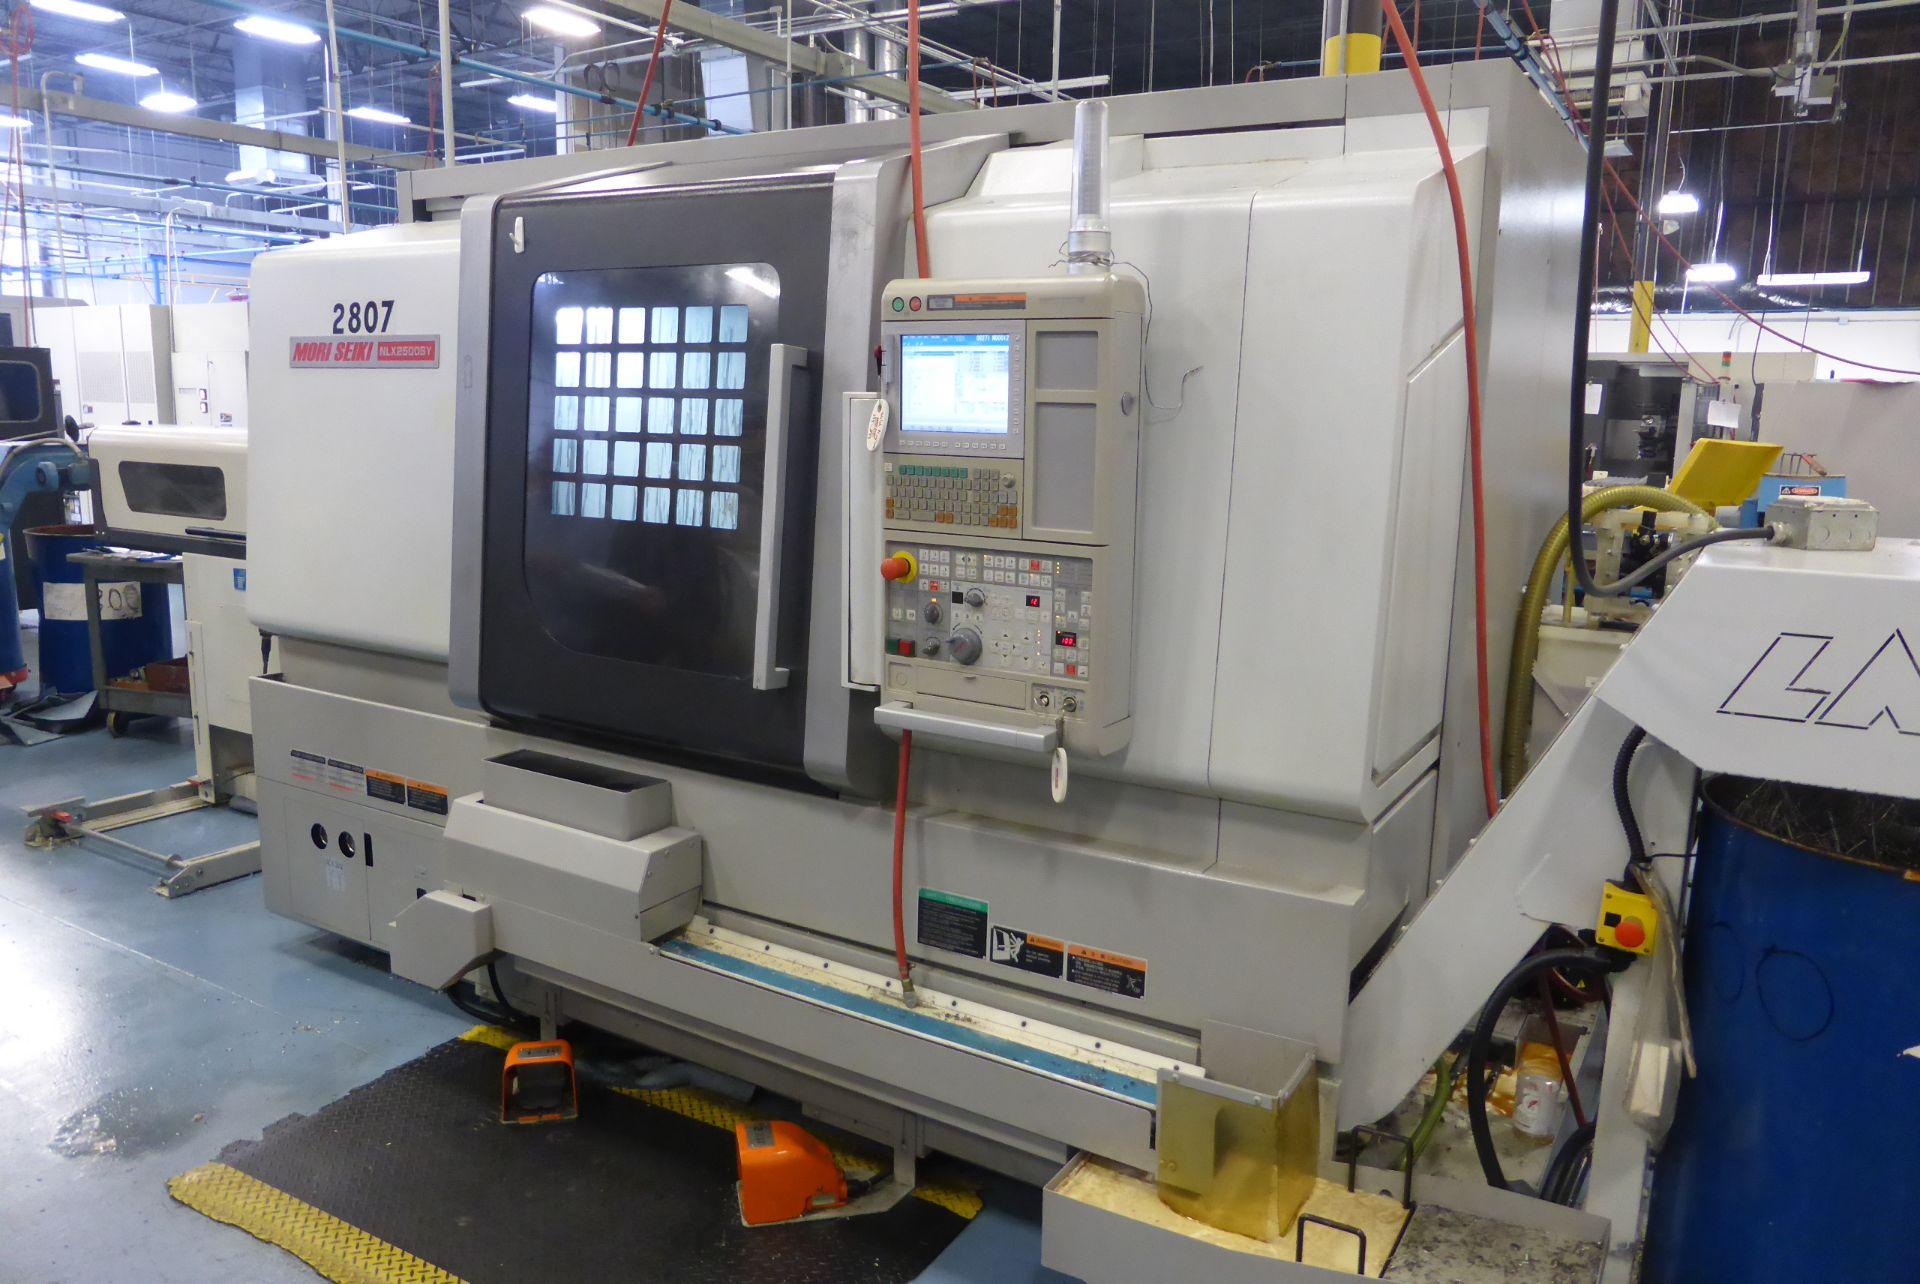 Lot 4 - MORI SEIKI NLX2500SY/700 CNC Turning & Milling Center (2011)